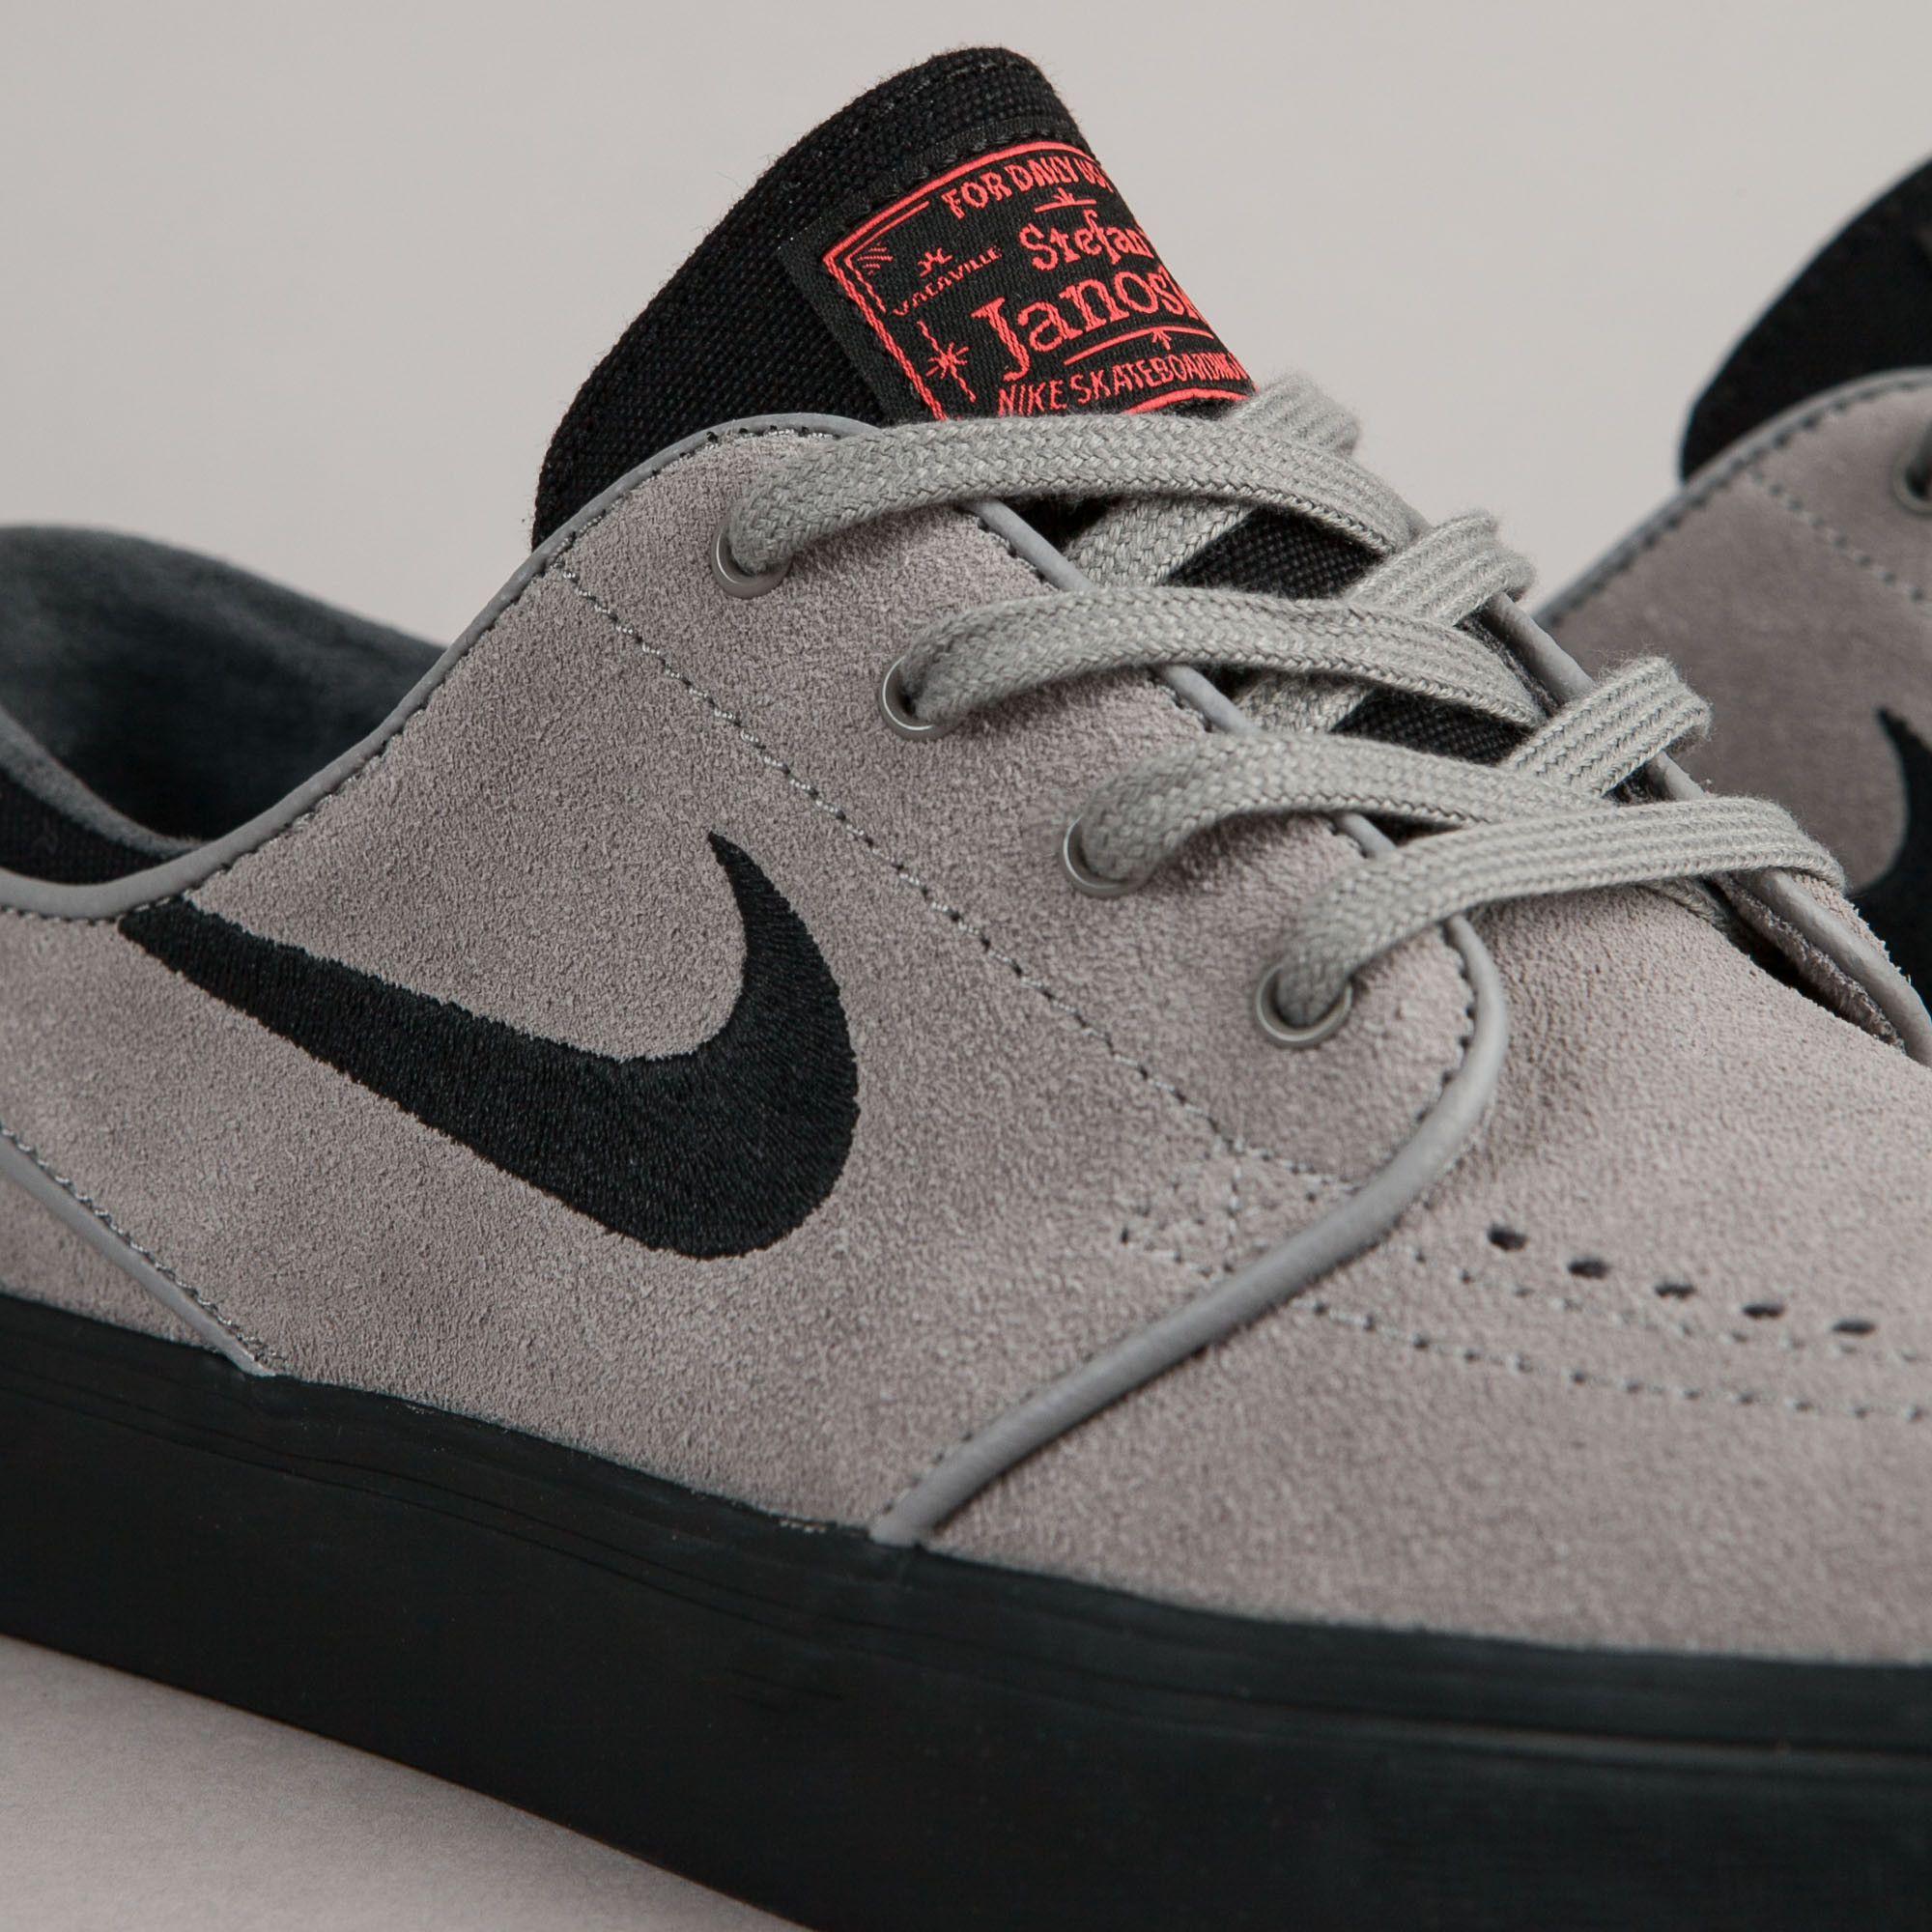 960e56c26c16 Nike SB Stefan Janoski Shoes - Dust   Black - Ember Glow - White ...